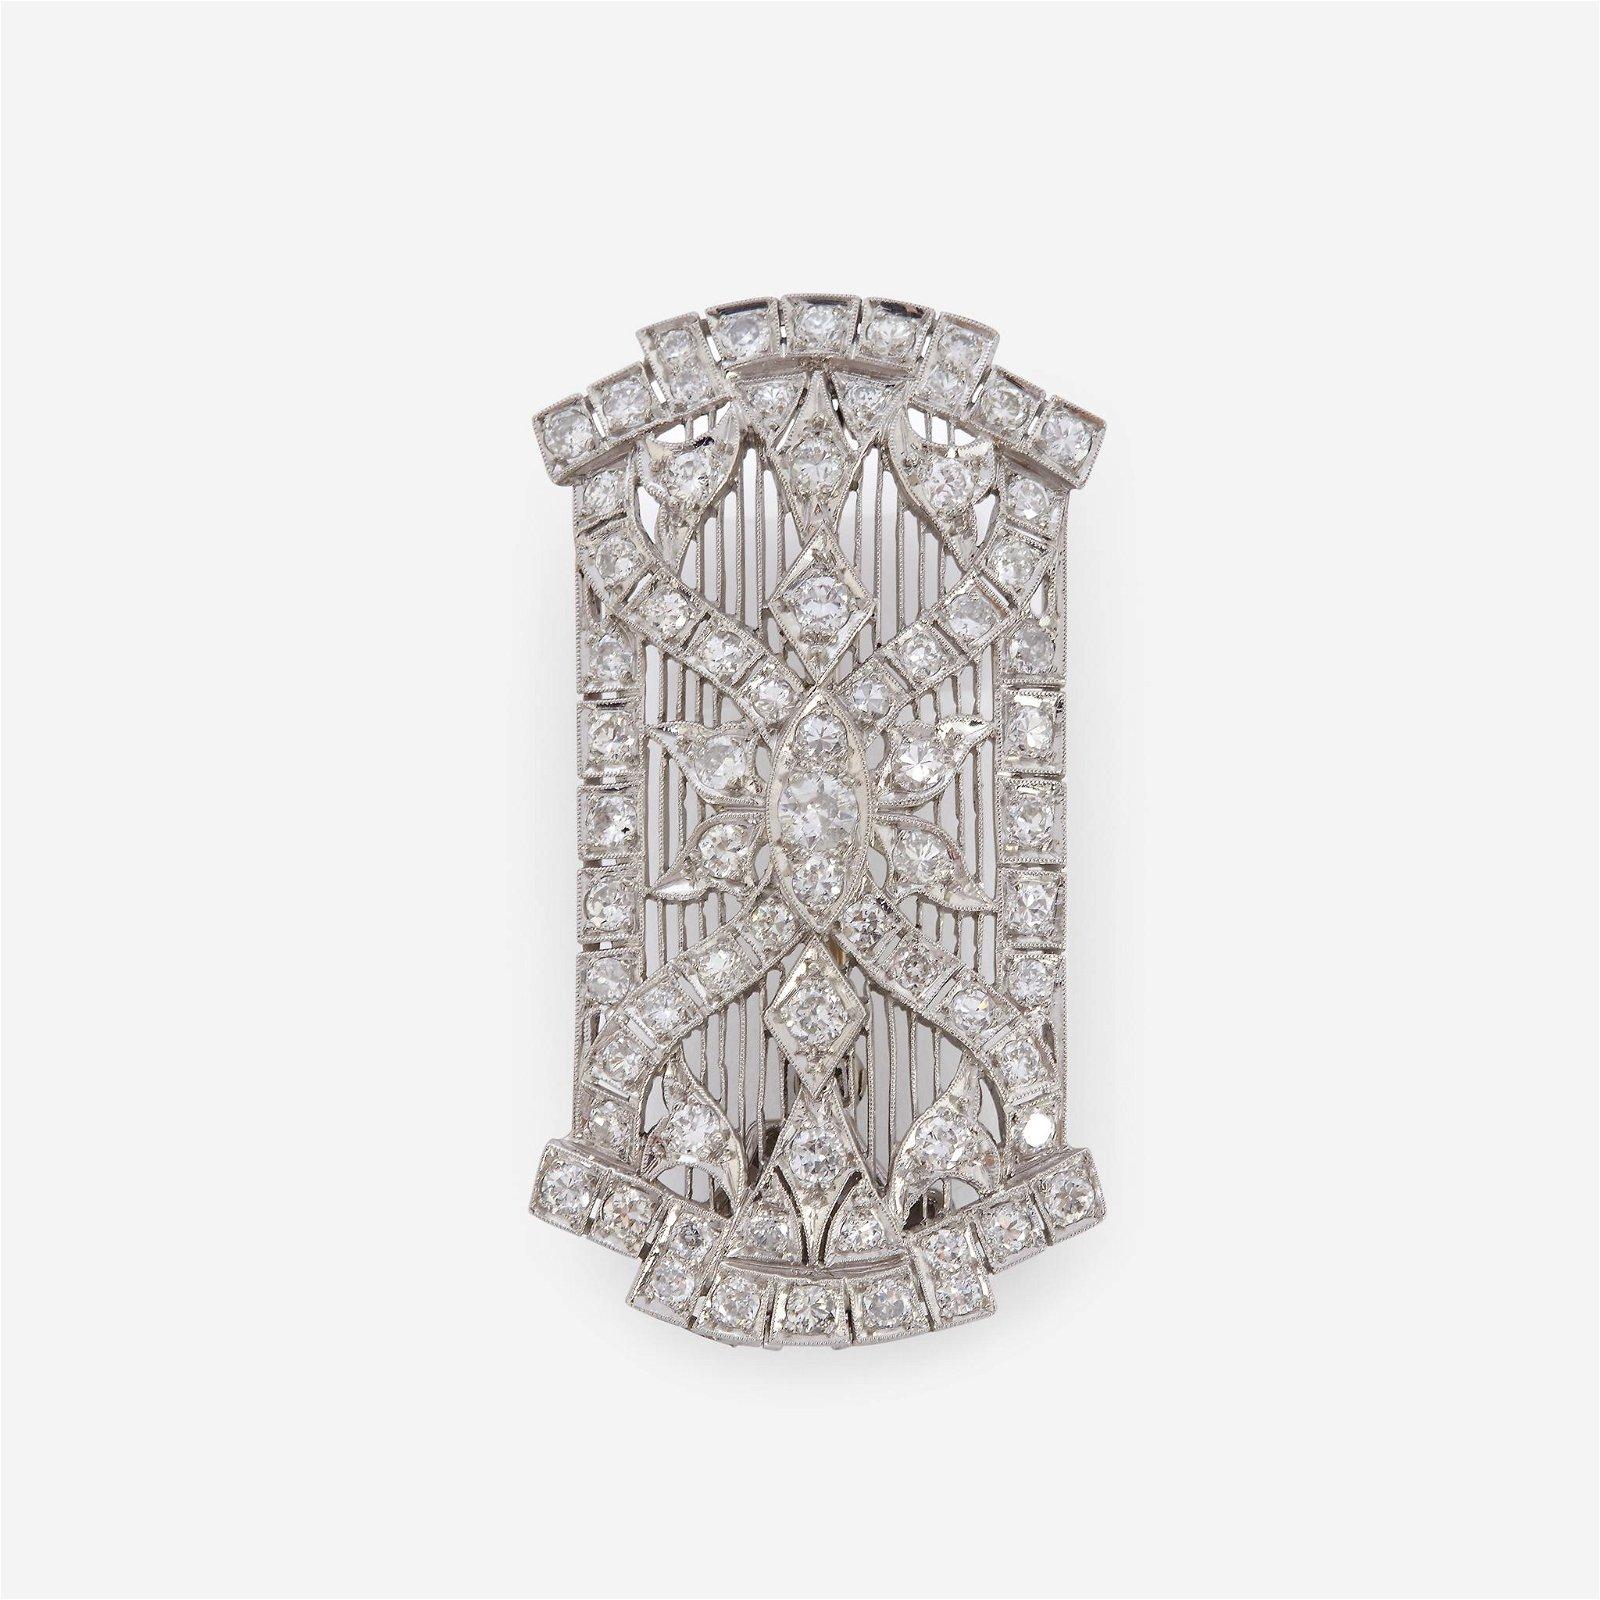 An Art Deco diamond and platinum pendant brooch,